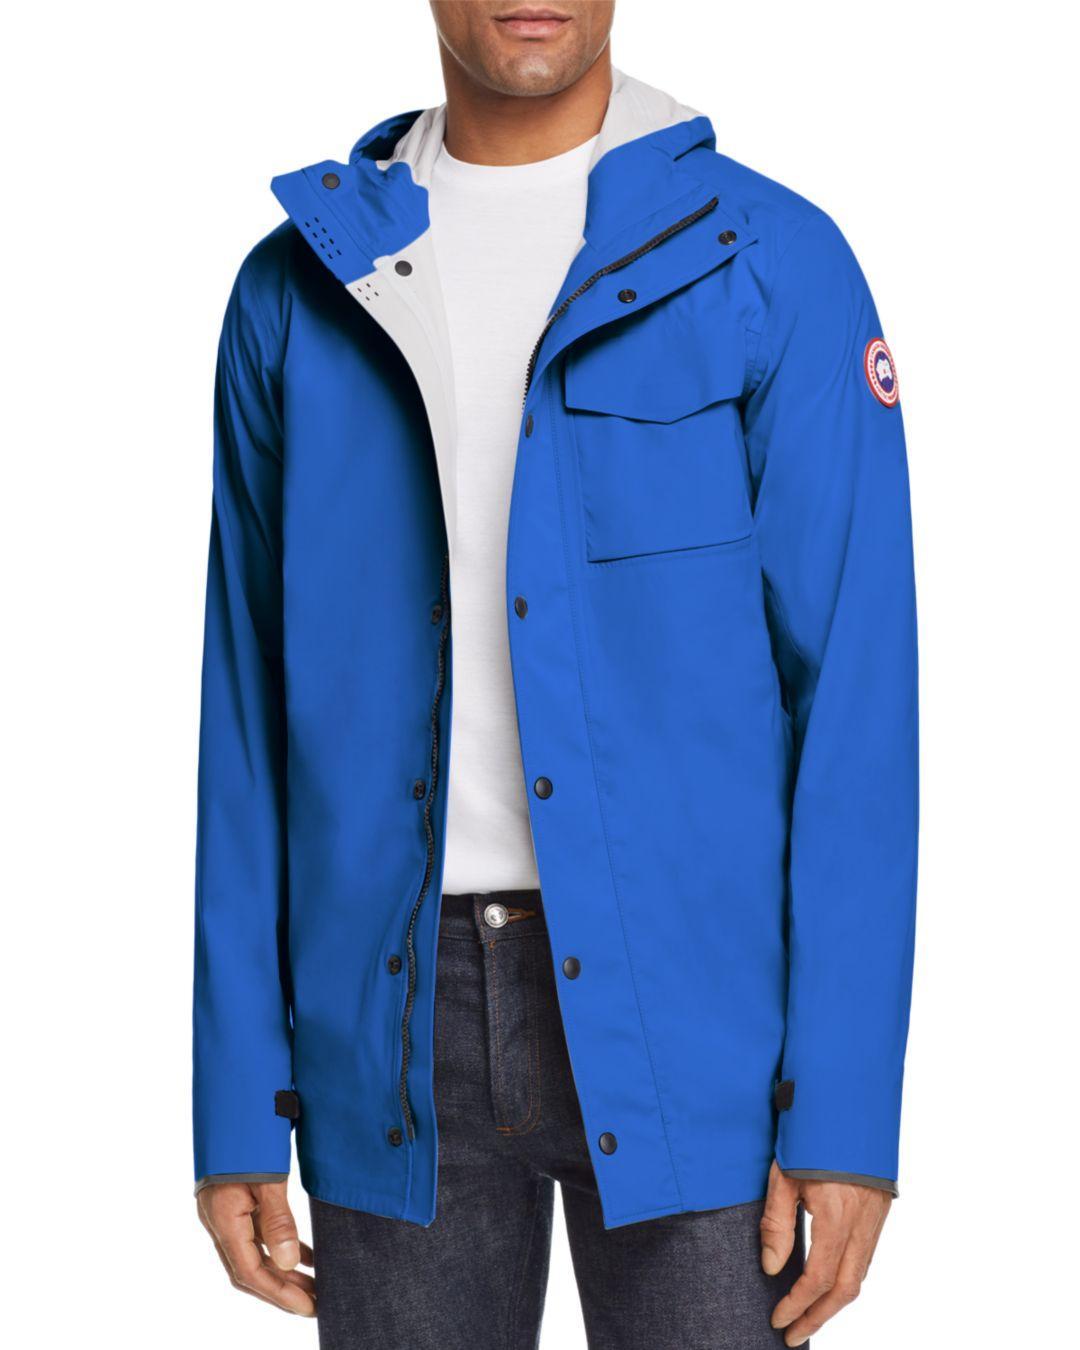 fe9497211e Lyst - Canada Goose Nanaimo Lightweight Rain Jacket in Blue for Men